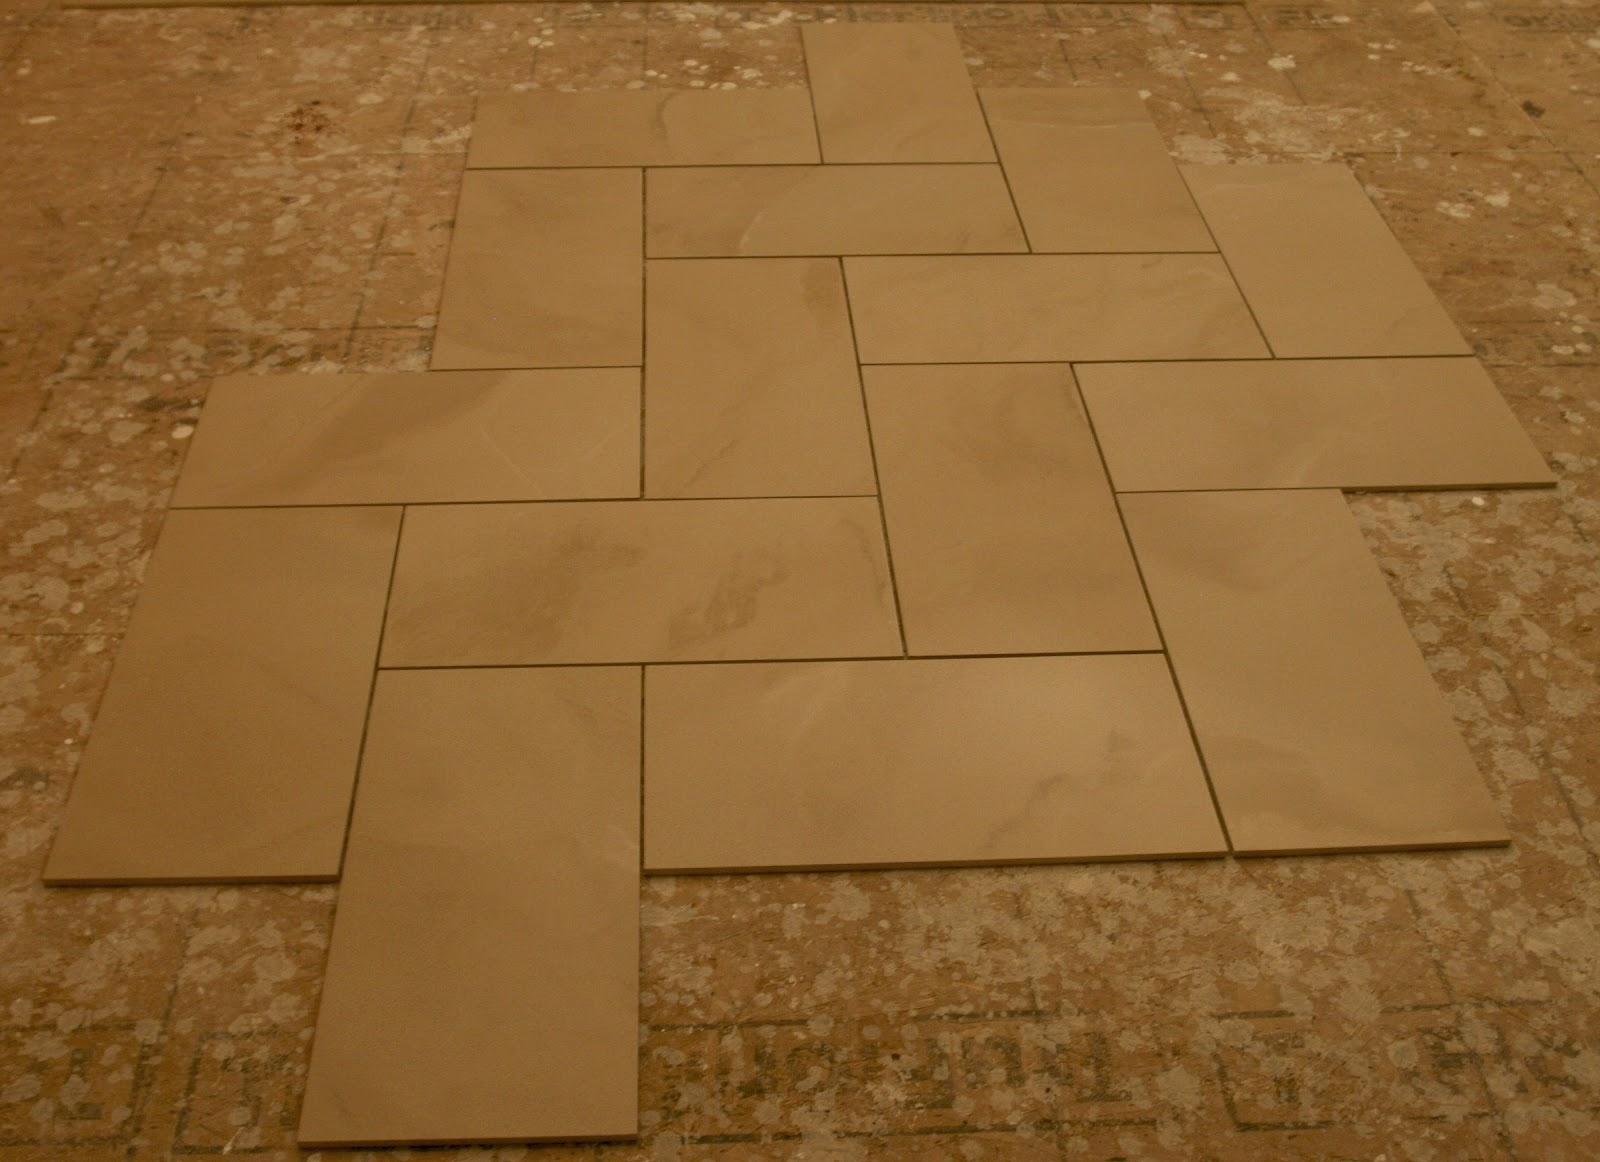 floor tile patterns our adventures in nottafarm forest floor pattern options 12x24 floor tile  patterns IGIZTDA